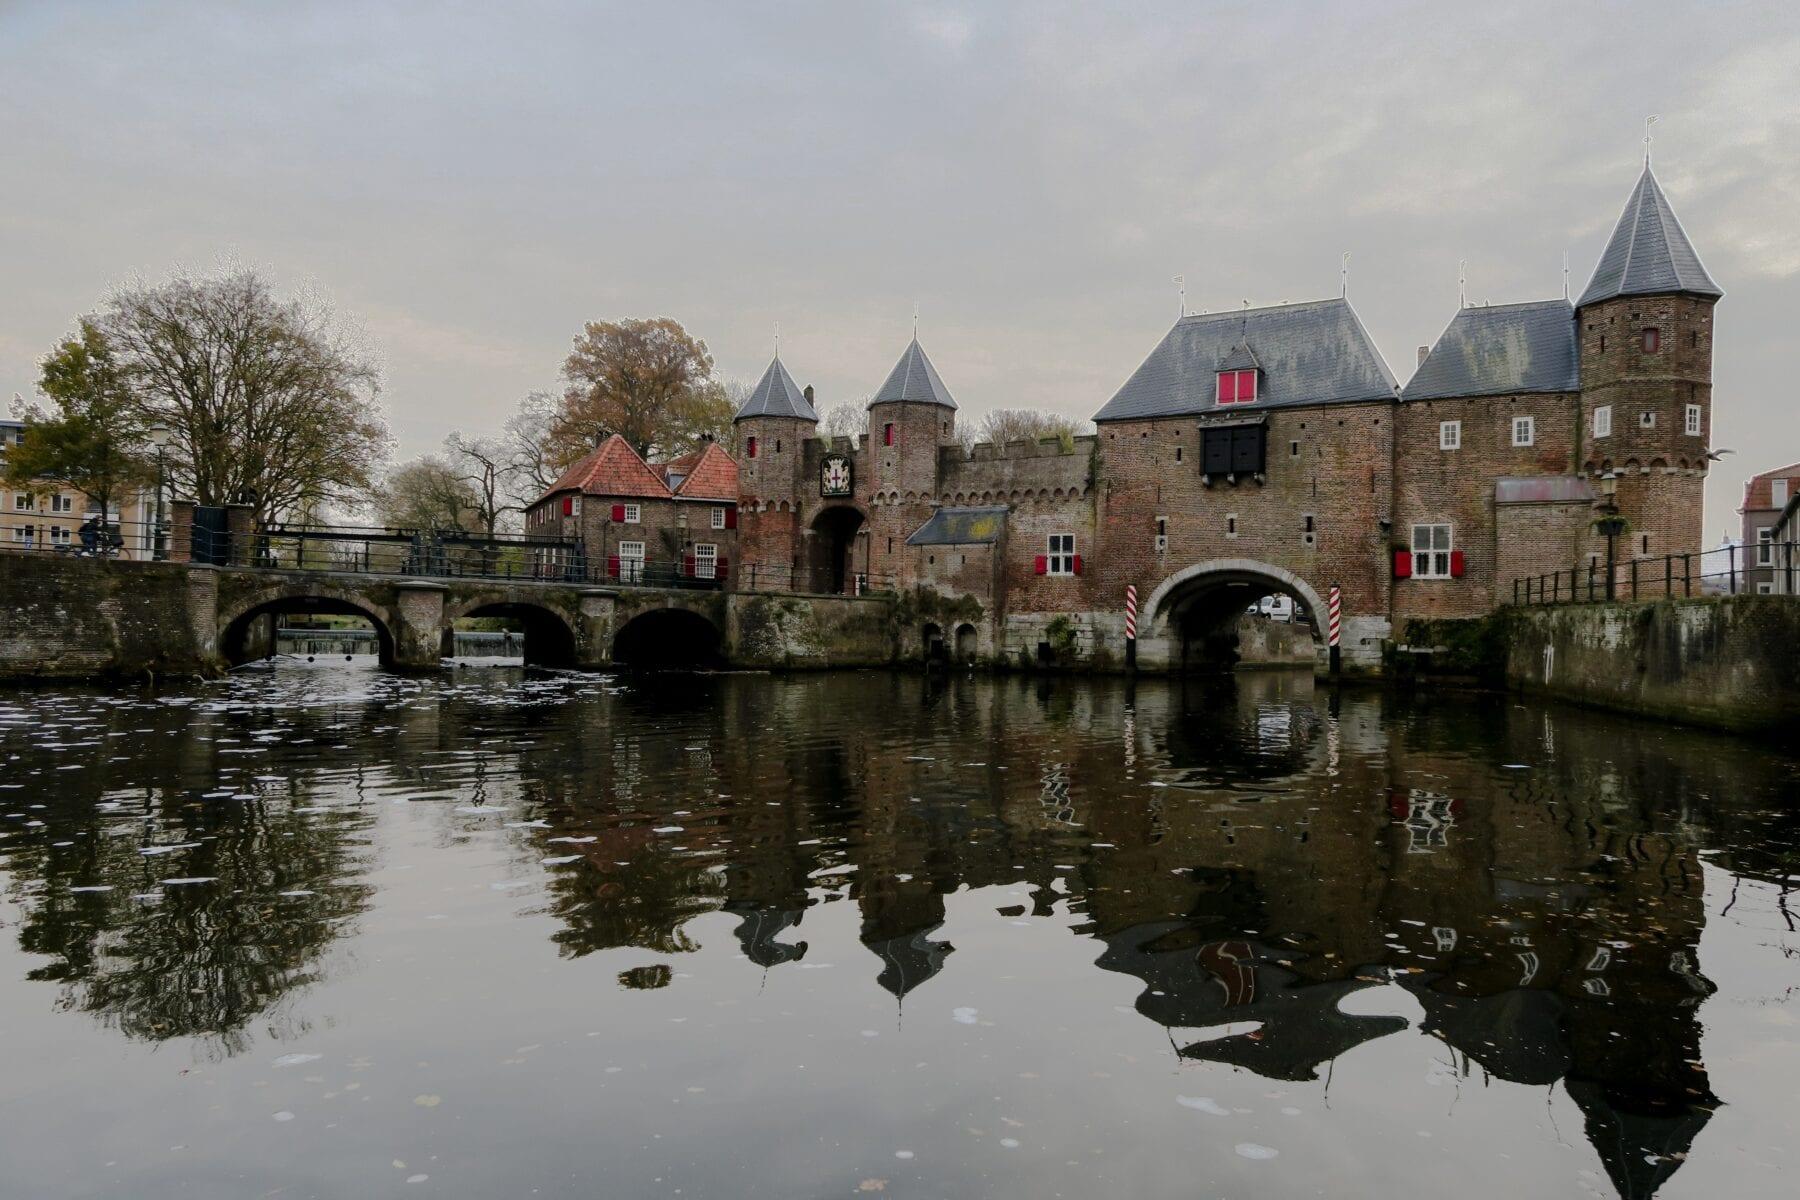 sup Amesfoort